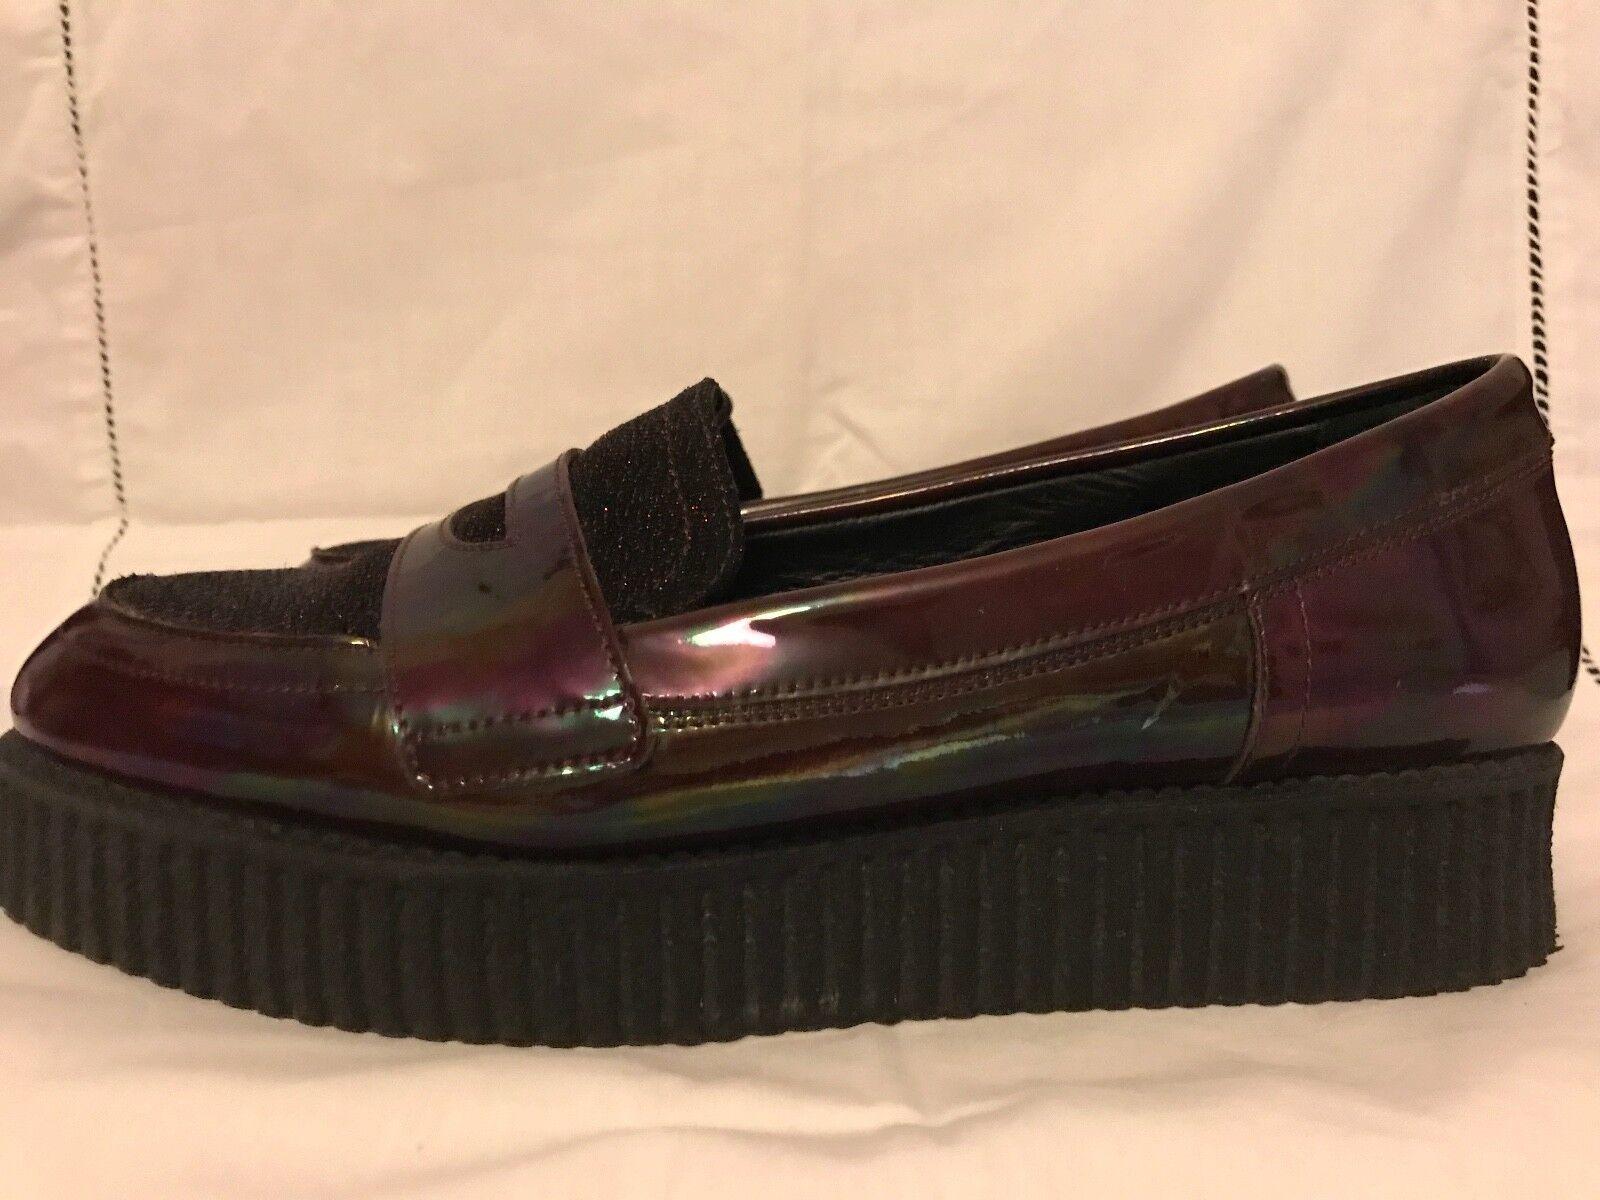 SONIA RYKIEL Schuhe, BURGUNDY/BLACK GLITTER PATTENED PLATFORM Schuhe, RYKIEL Größe 41(EU)/8(UK) 7f789f